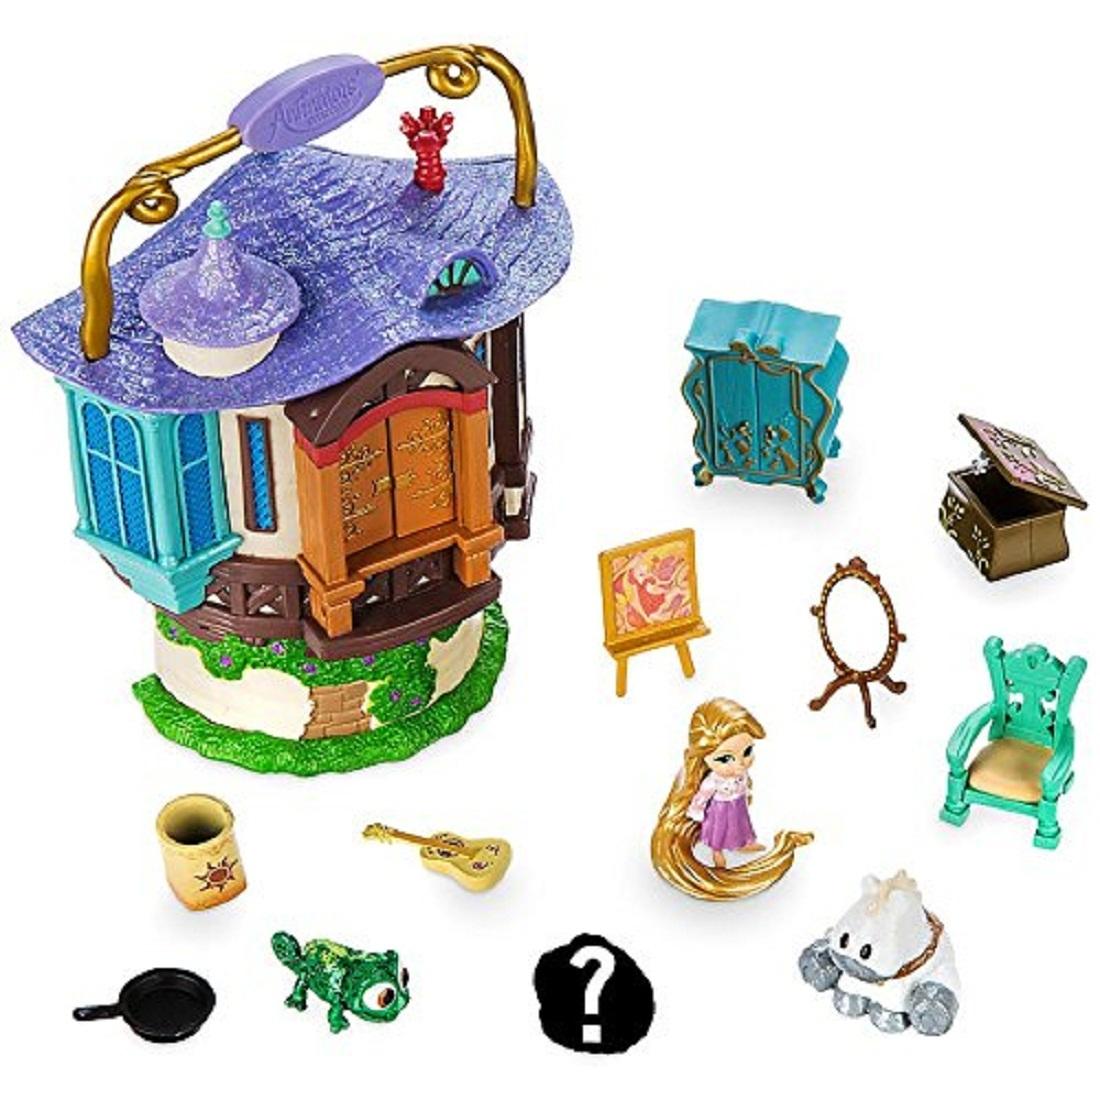 Disney Animators Collection Rapunzel Mini Doll Play Set 5 Inch